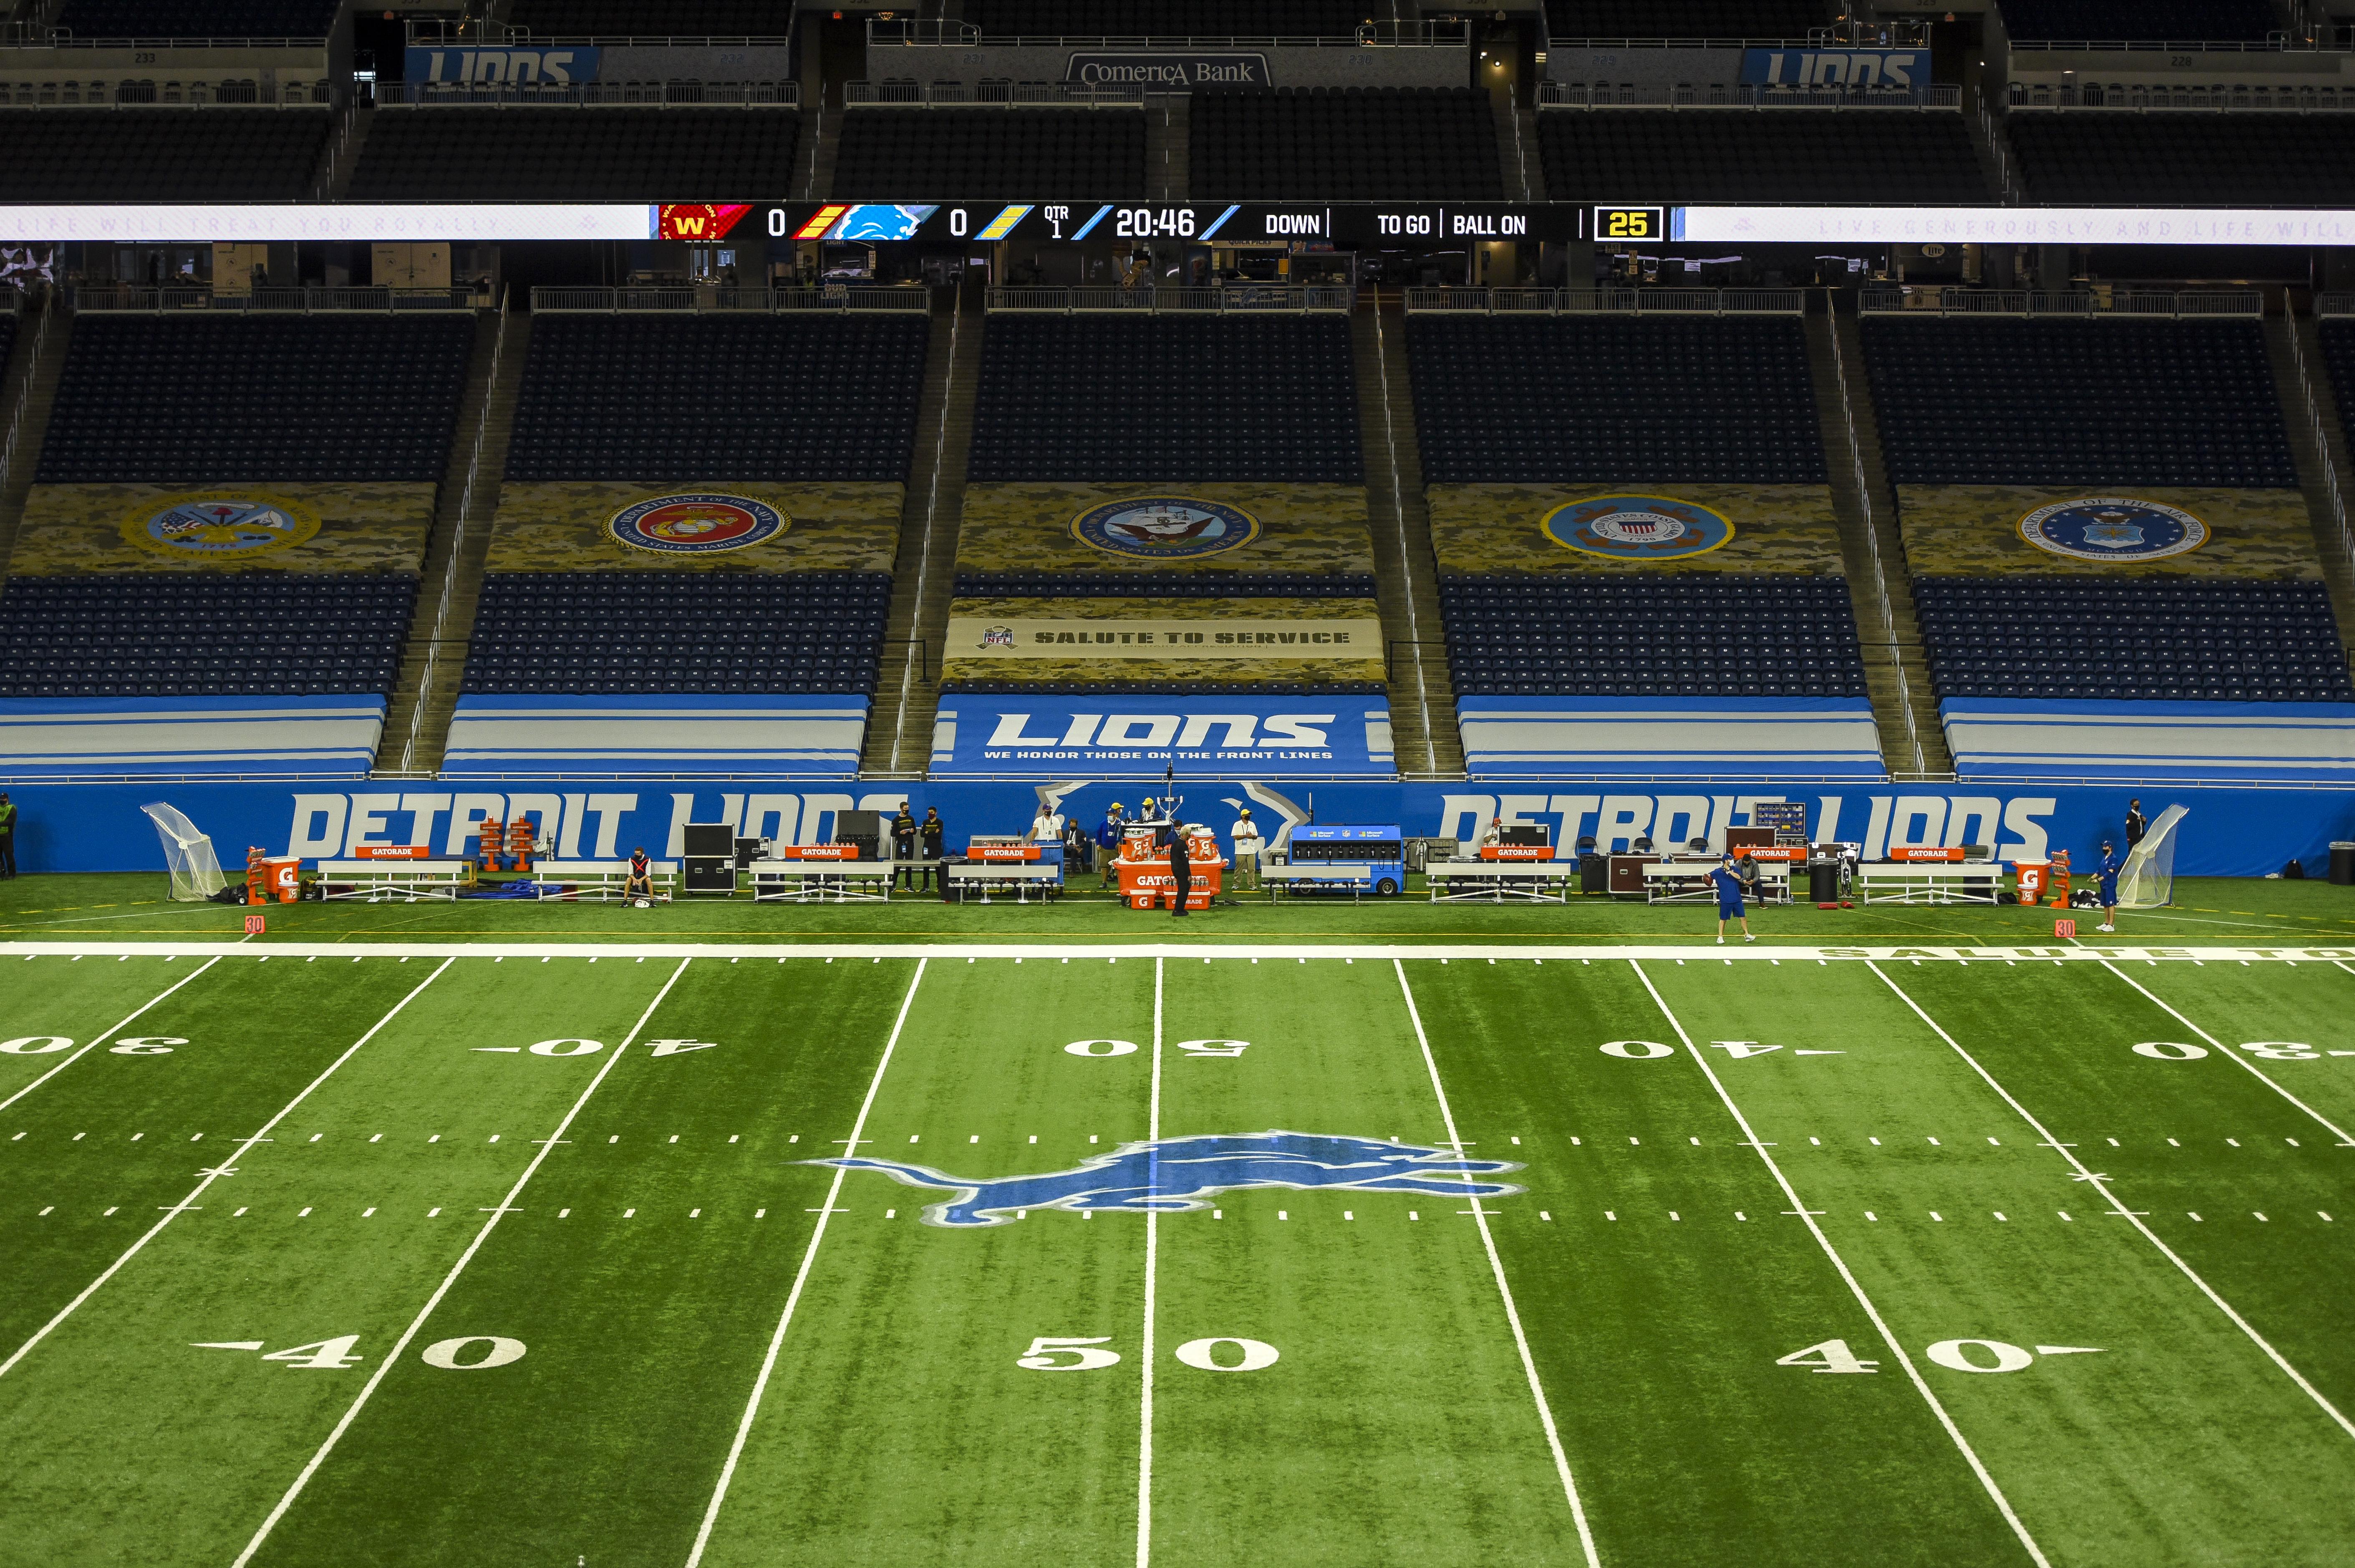 Washington Football Team v Detroit Lions